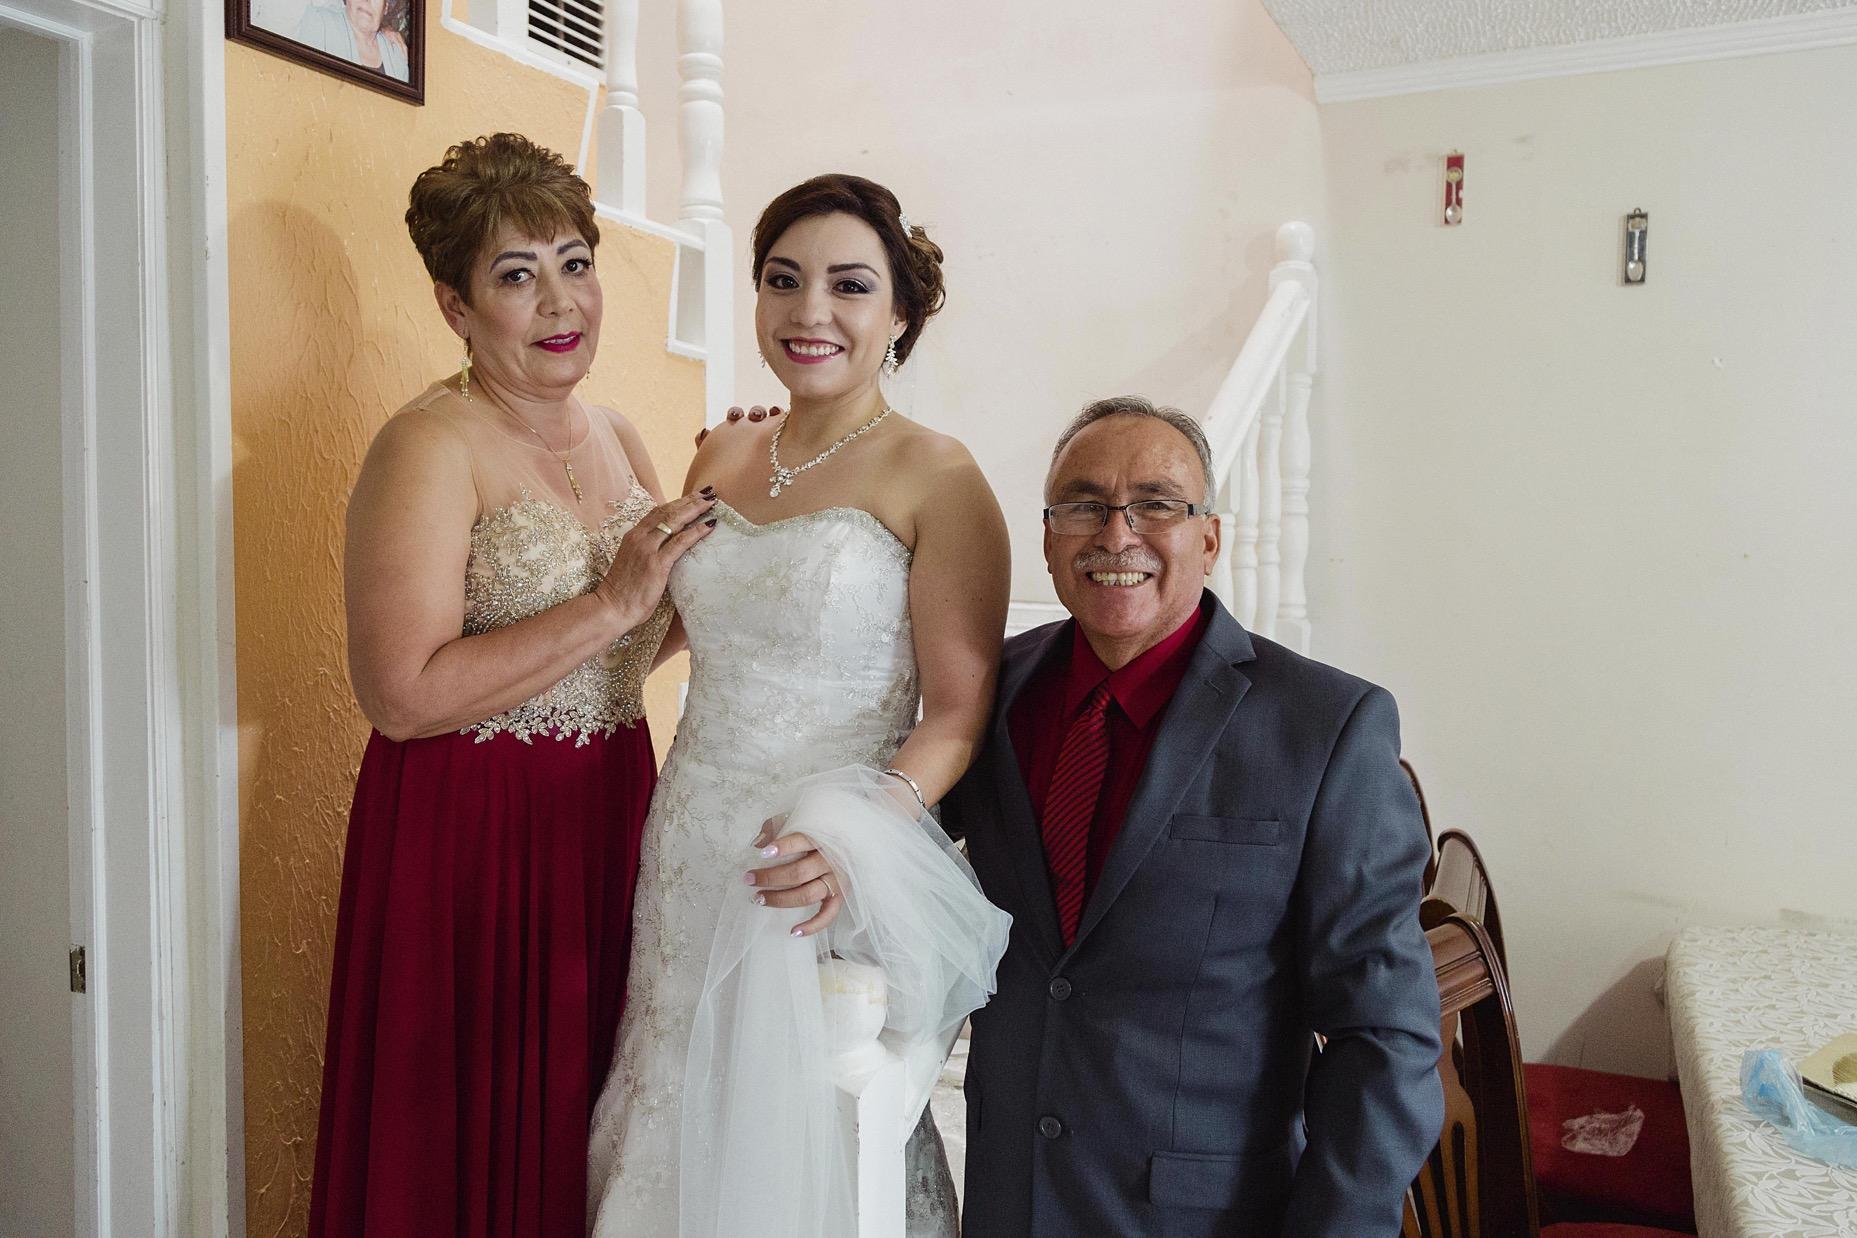 fotografo_profesional_bodas_xv_chihuahua_zacatecas_mexico-18